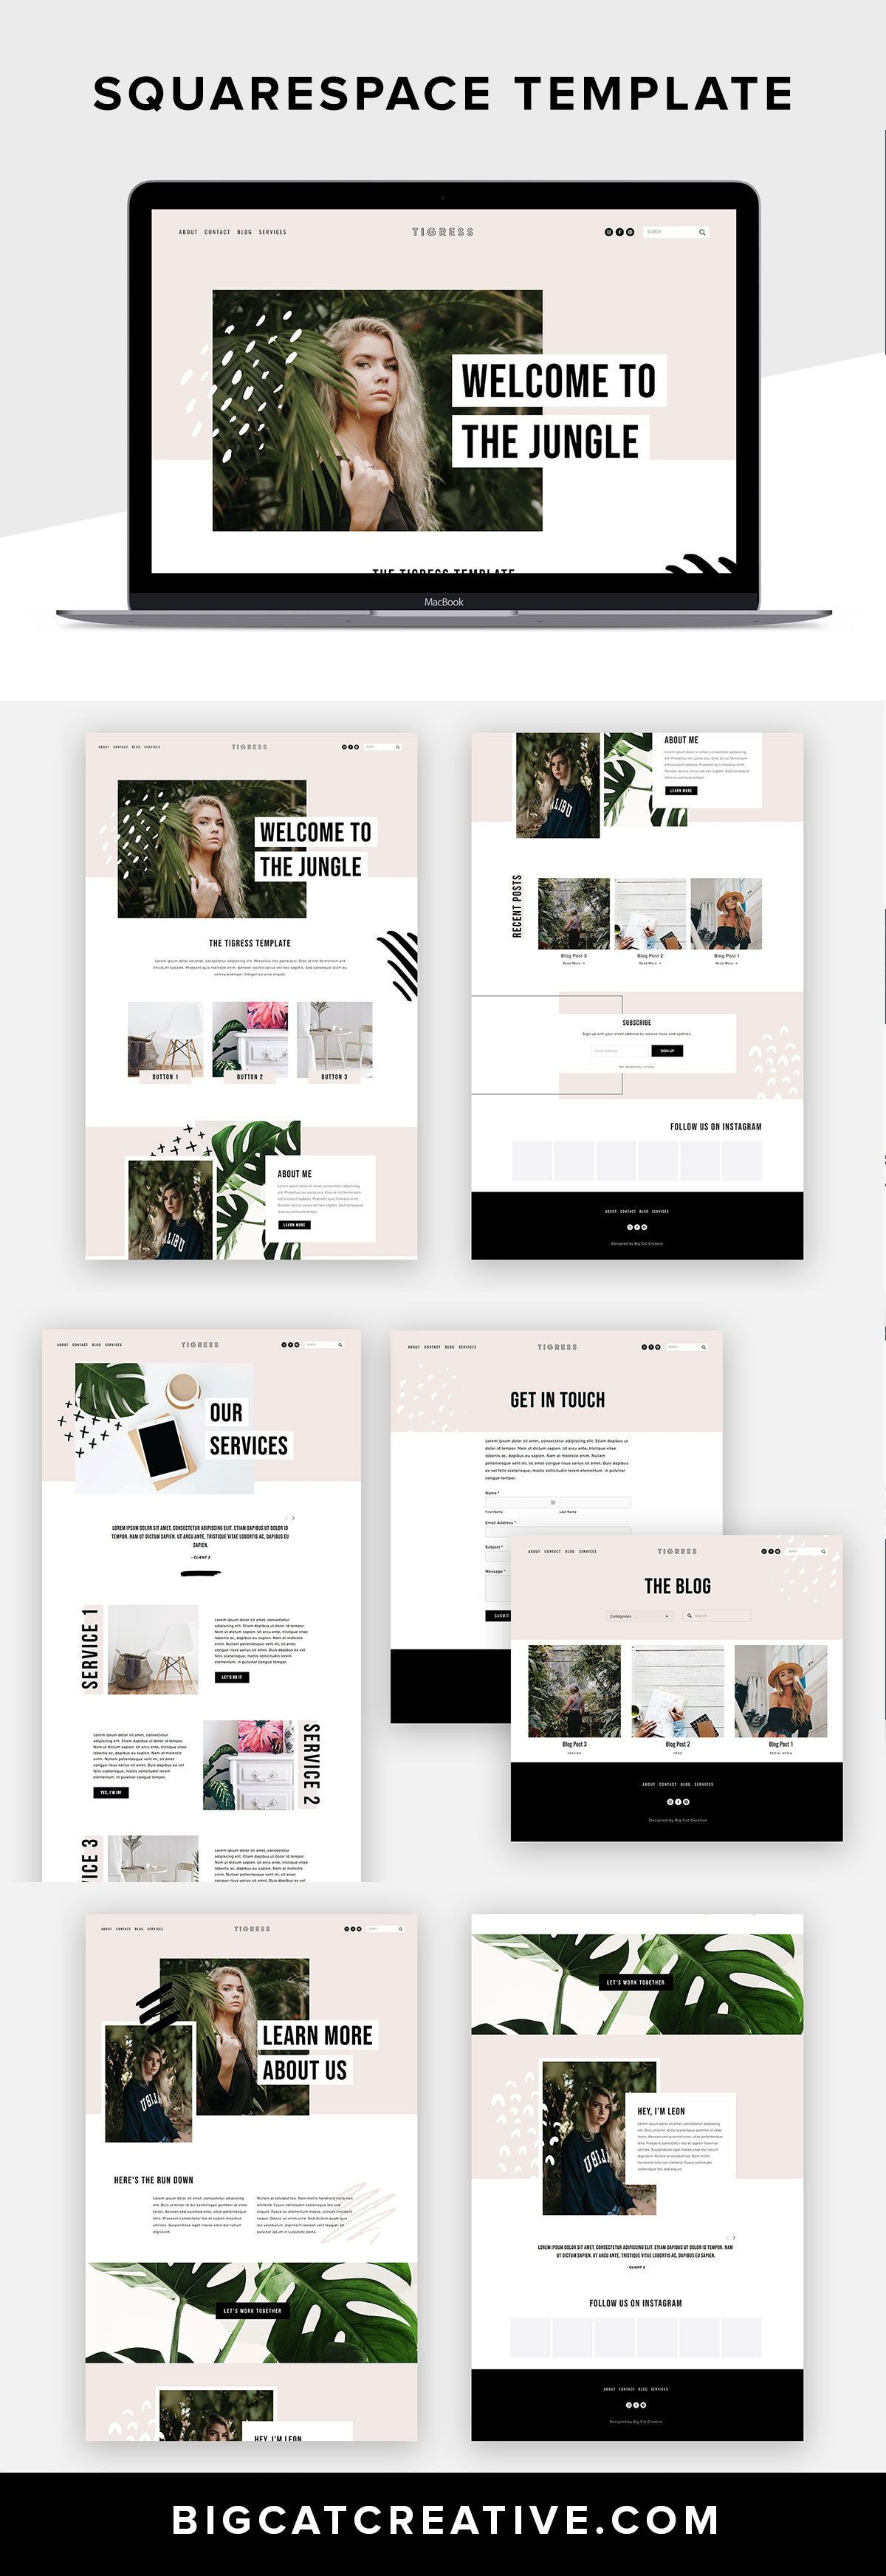 Tigress Squarespace Website Template By Big Cat Creative Squarespace Inspiration Diy Website Web Portfolio Web Design Business Web Design Web Design Tips